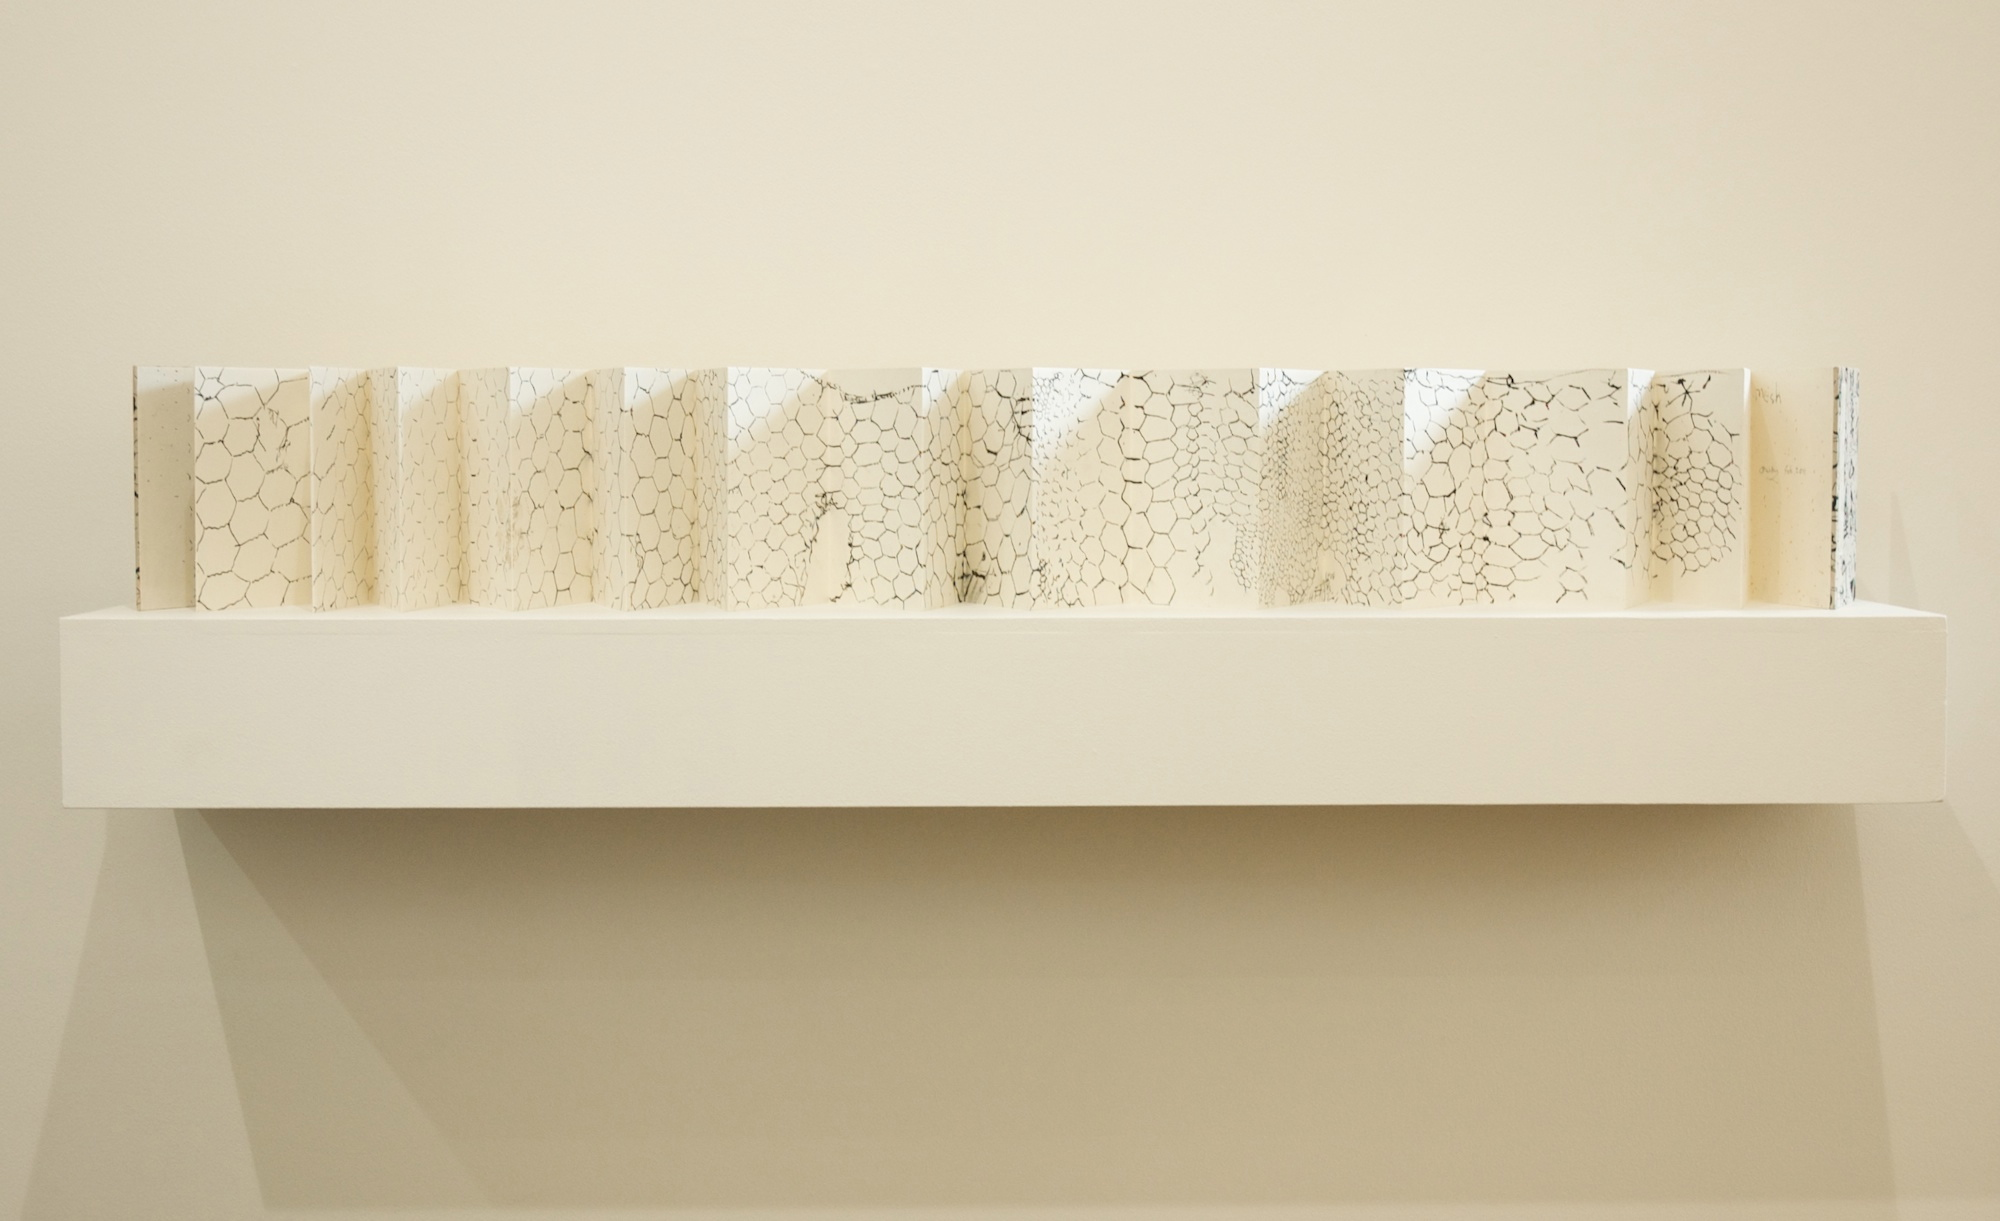 'Mesh' 2011 concertina artist book (gouache on paper) 20.5 x 337 cm